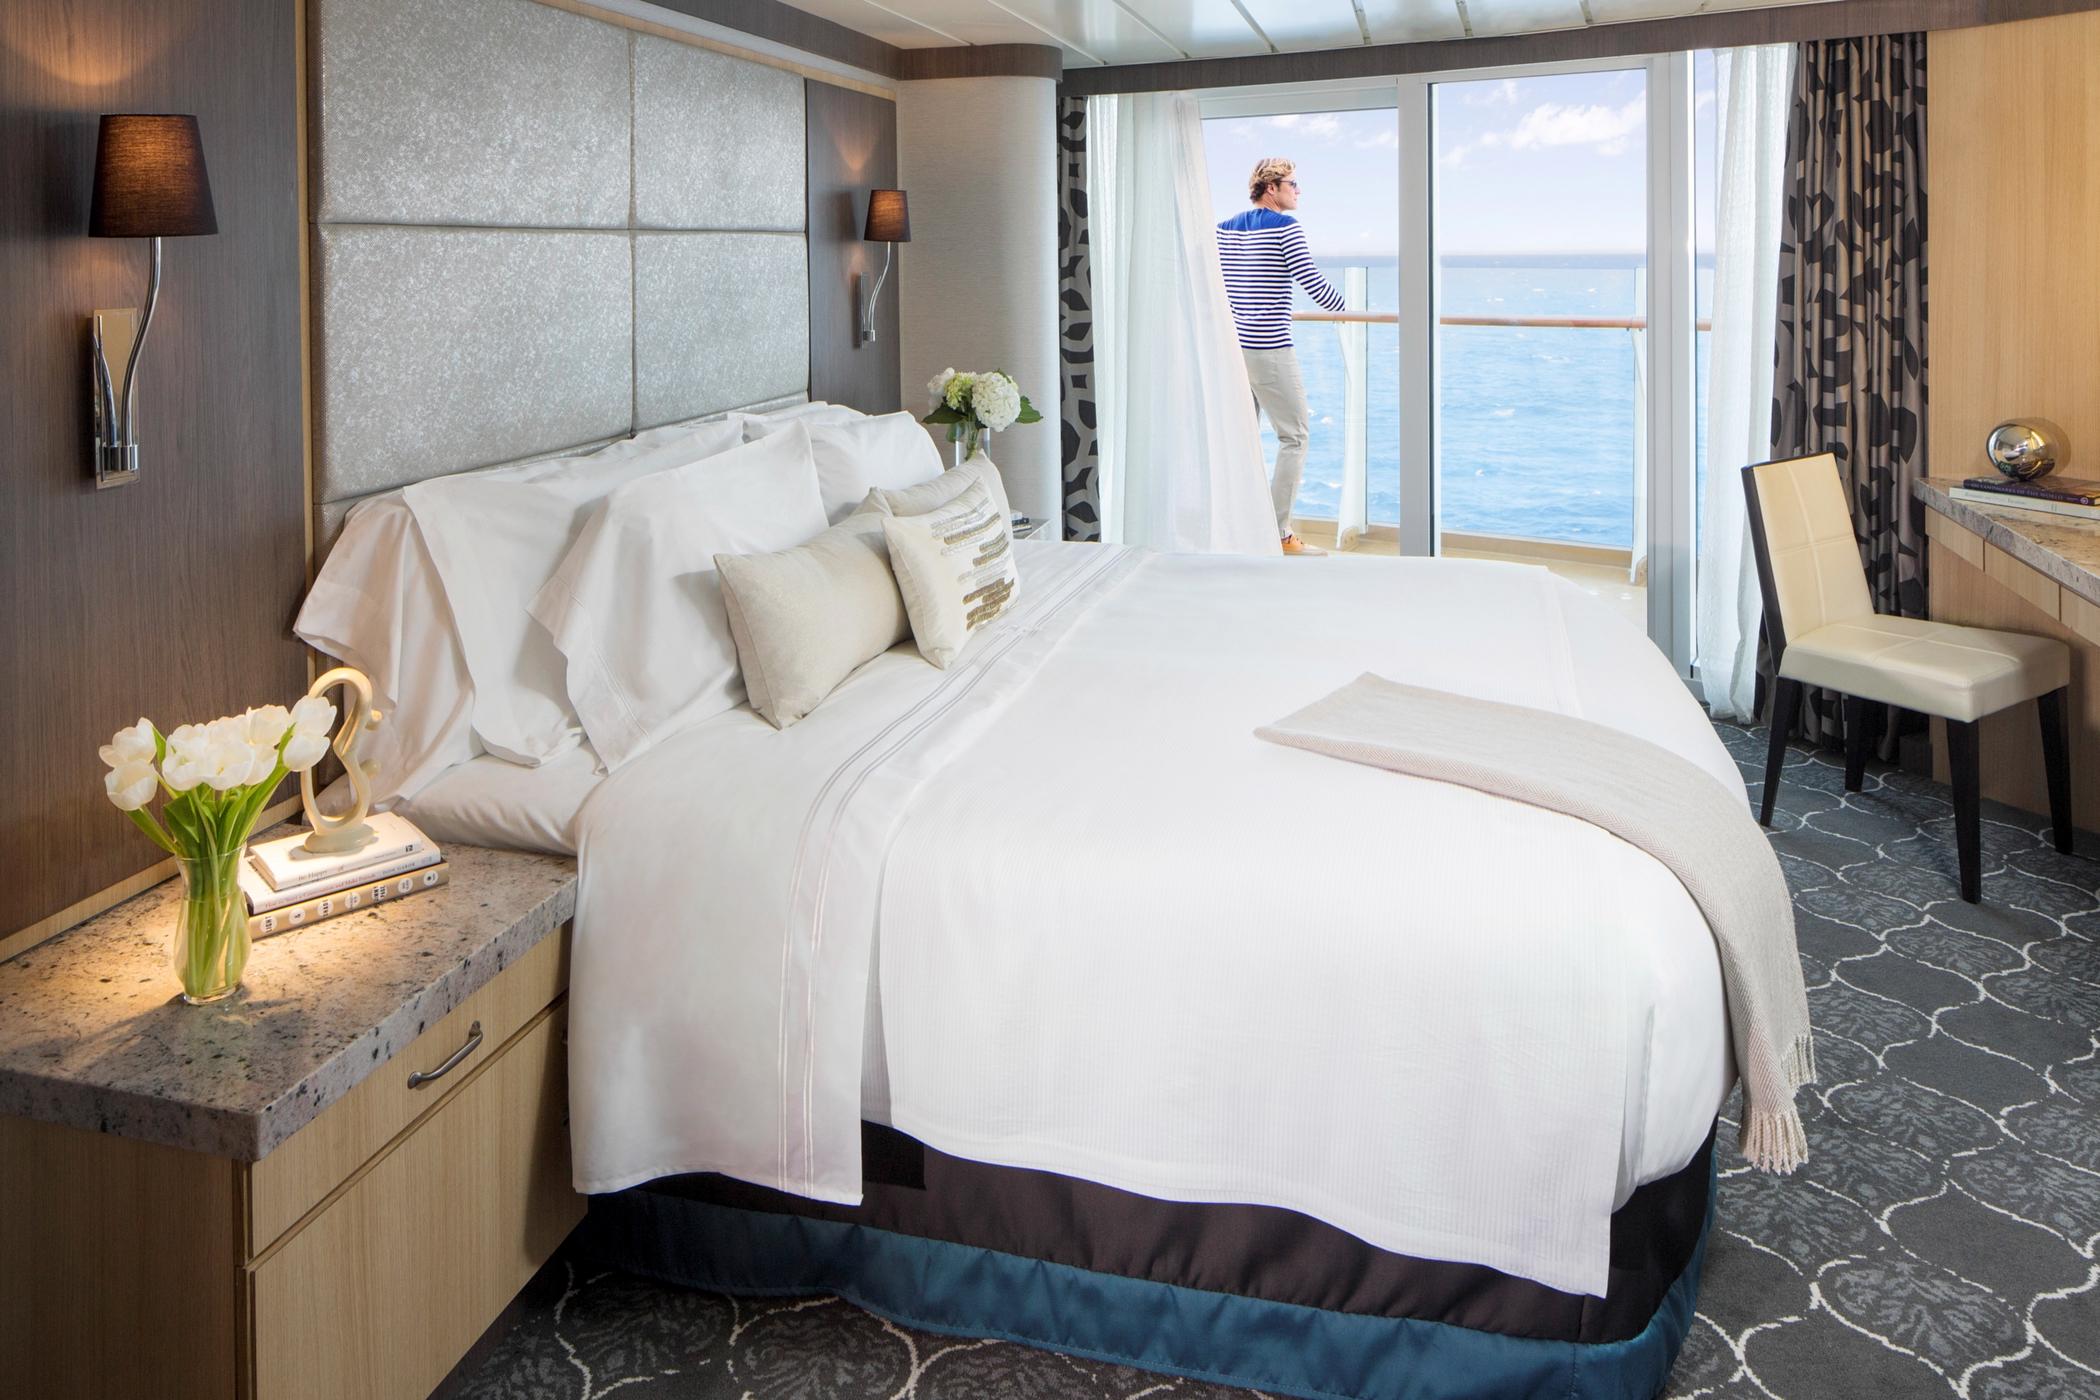 Royal Caribbean International Oasis of the seas accommodation Junior suite 2.jpg